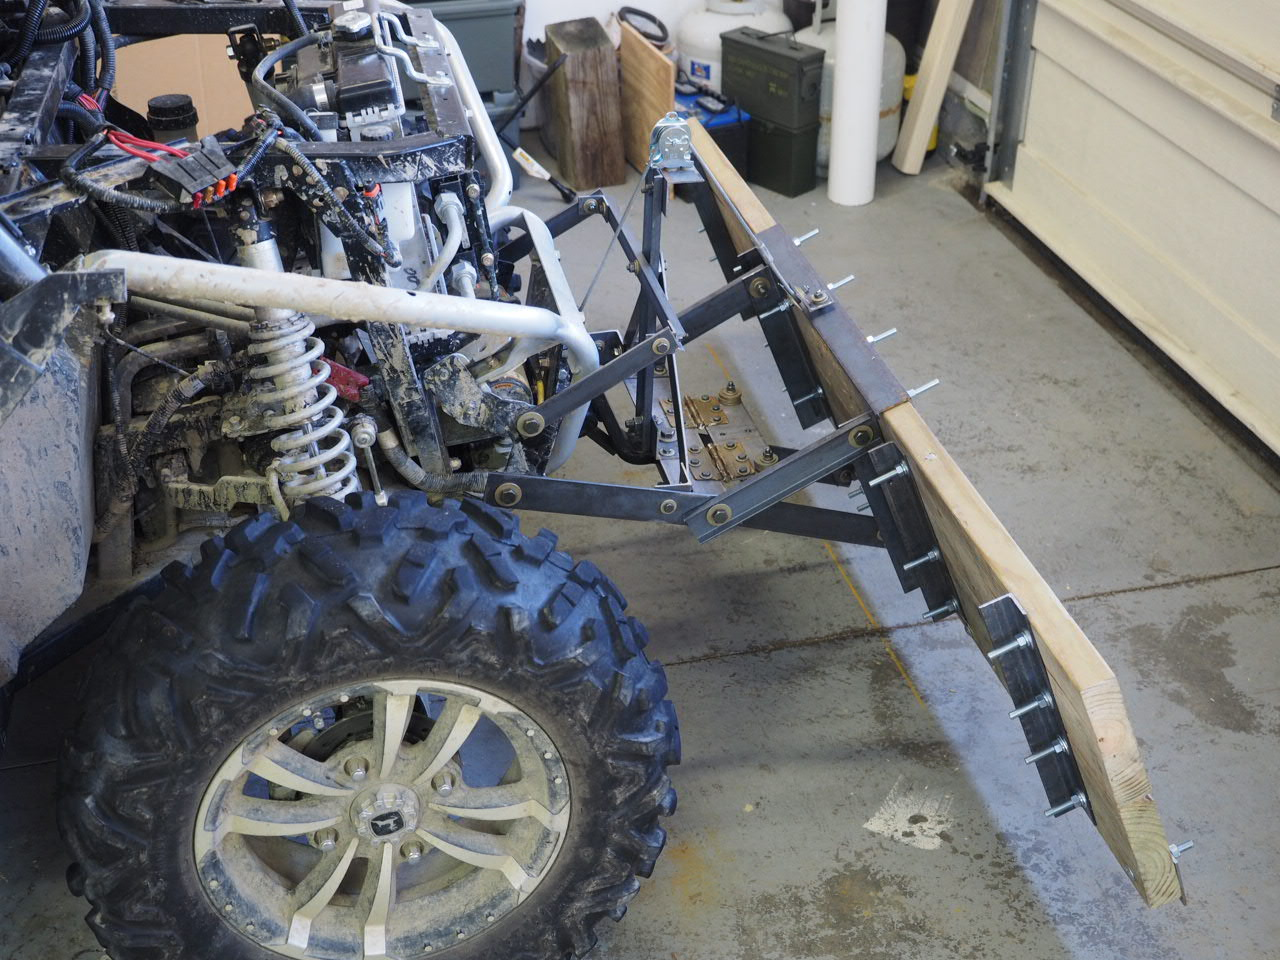 Home Built Snow Plow For 850i John Deere Gator Forums